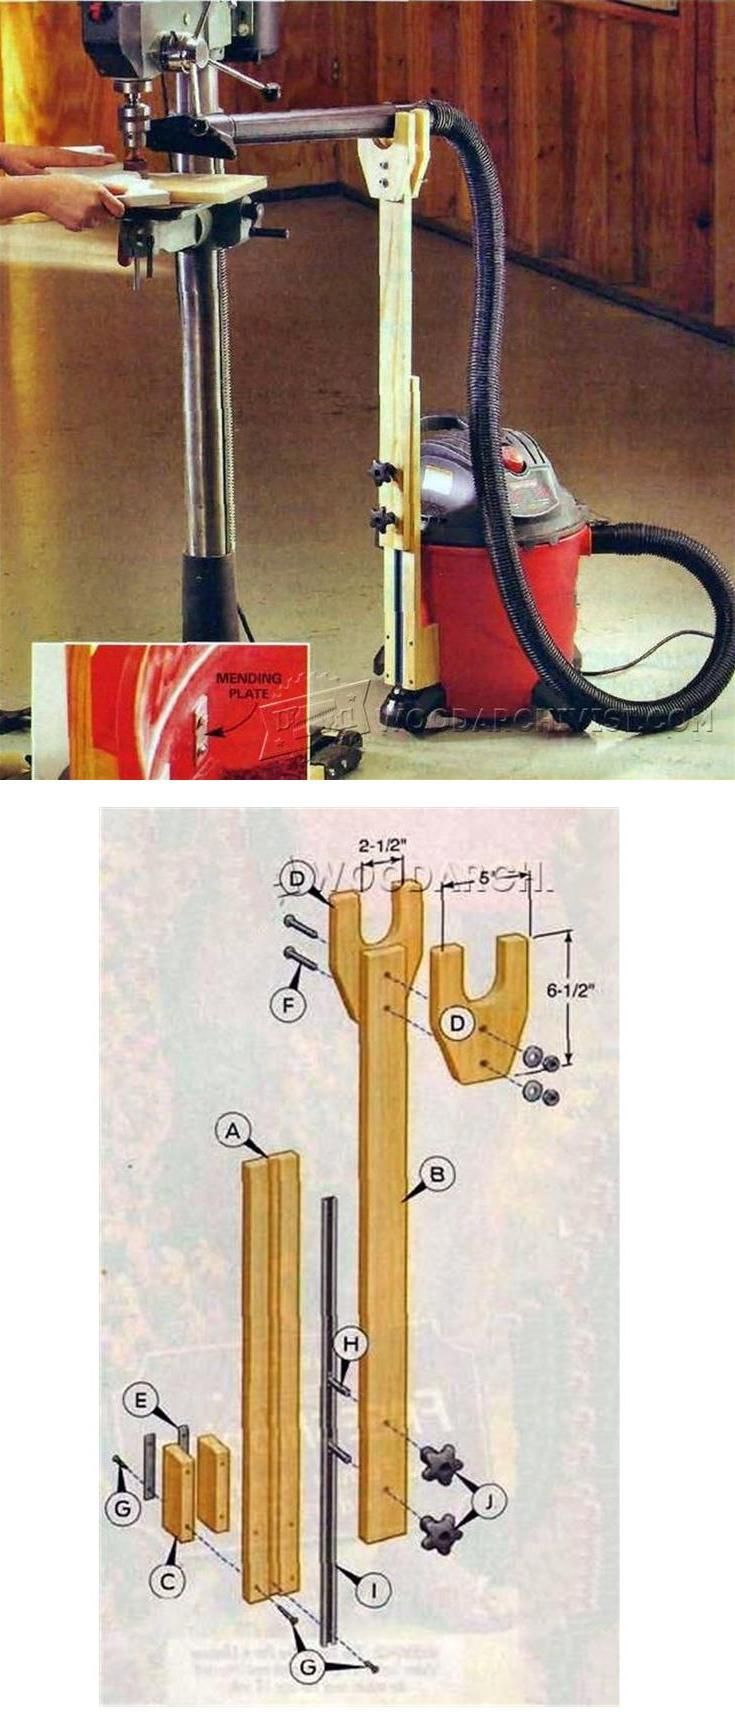 DIY Adjustable Dust Control - Dust Collection Tips, Jigs and Fixtures   WoodArchivist.com